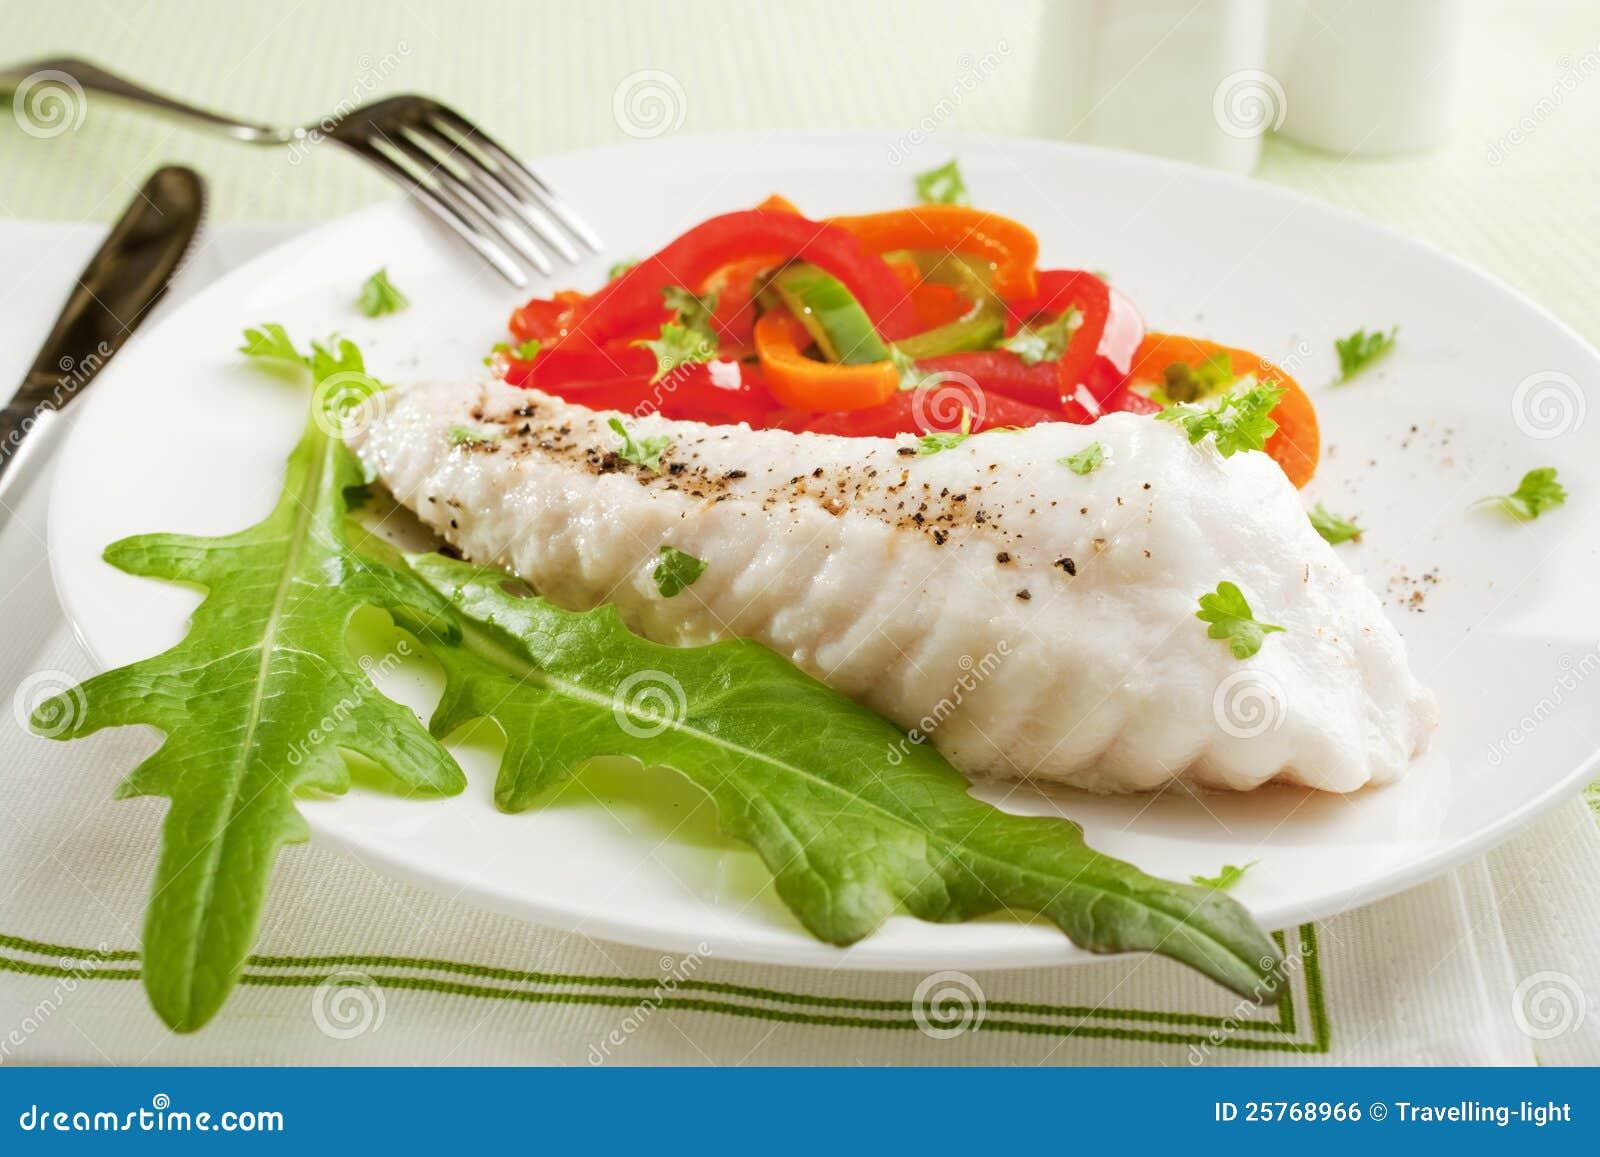 Fish dinner stock photo image of capsicums lettuce for Best fish dinner near me